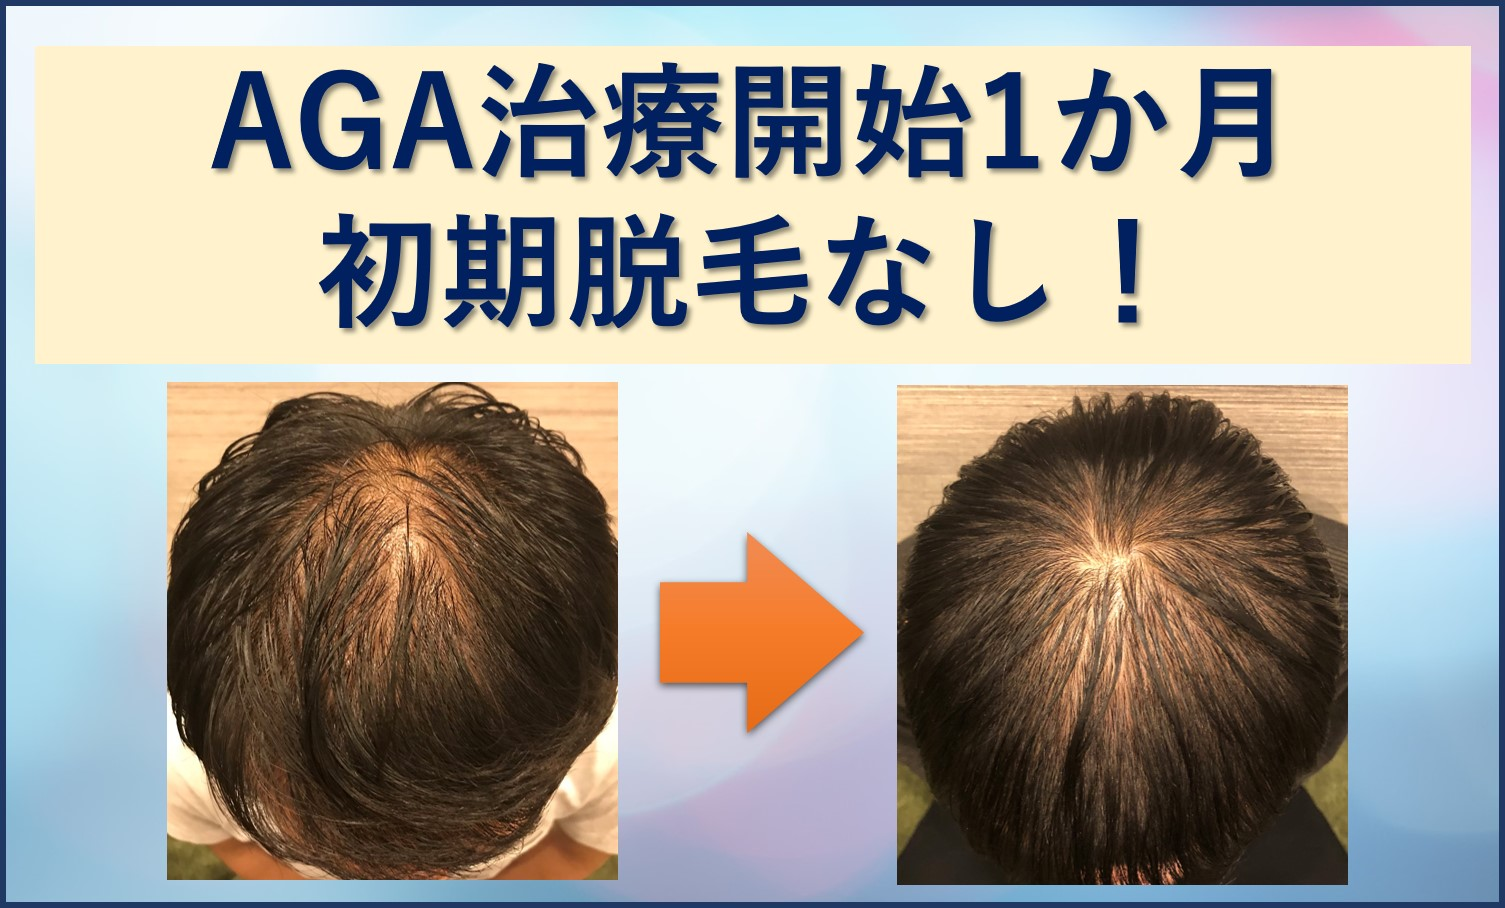 AGA治療1か月目、初期脱毛無し